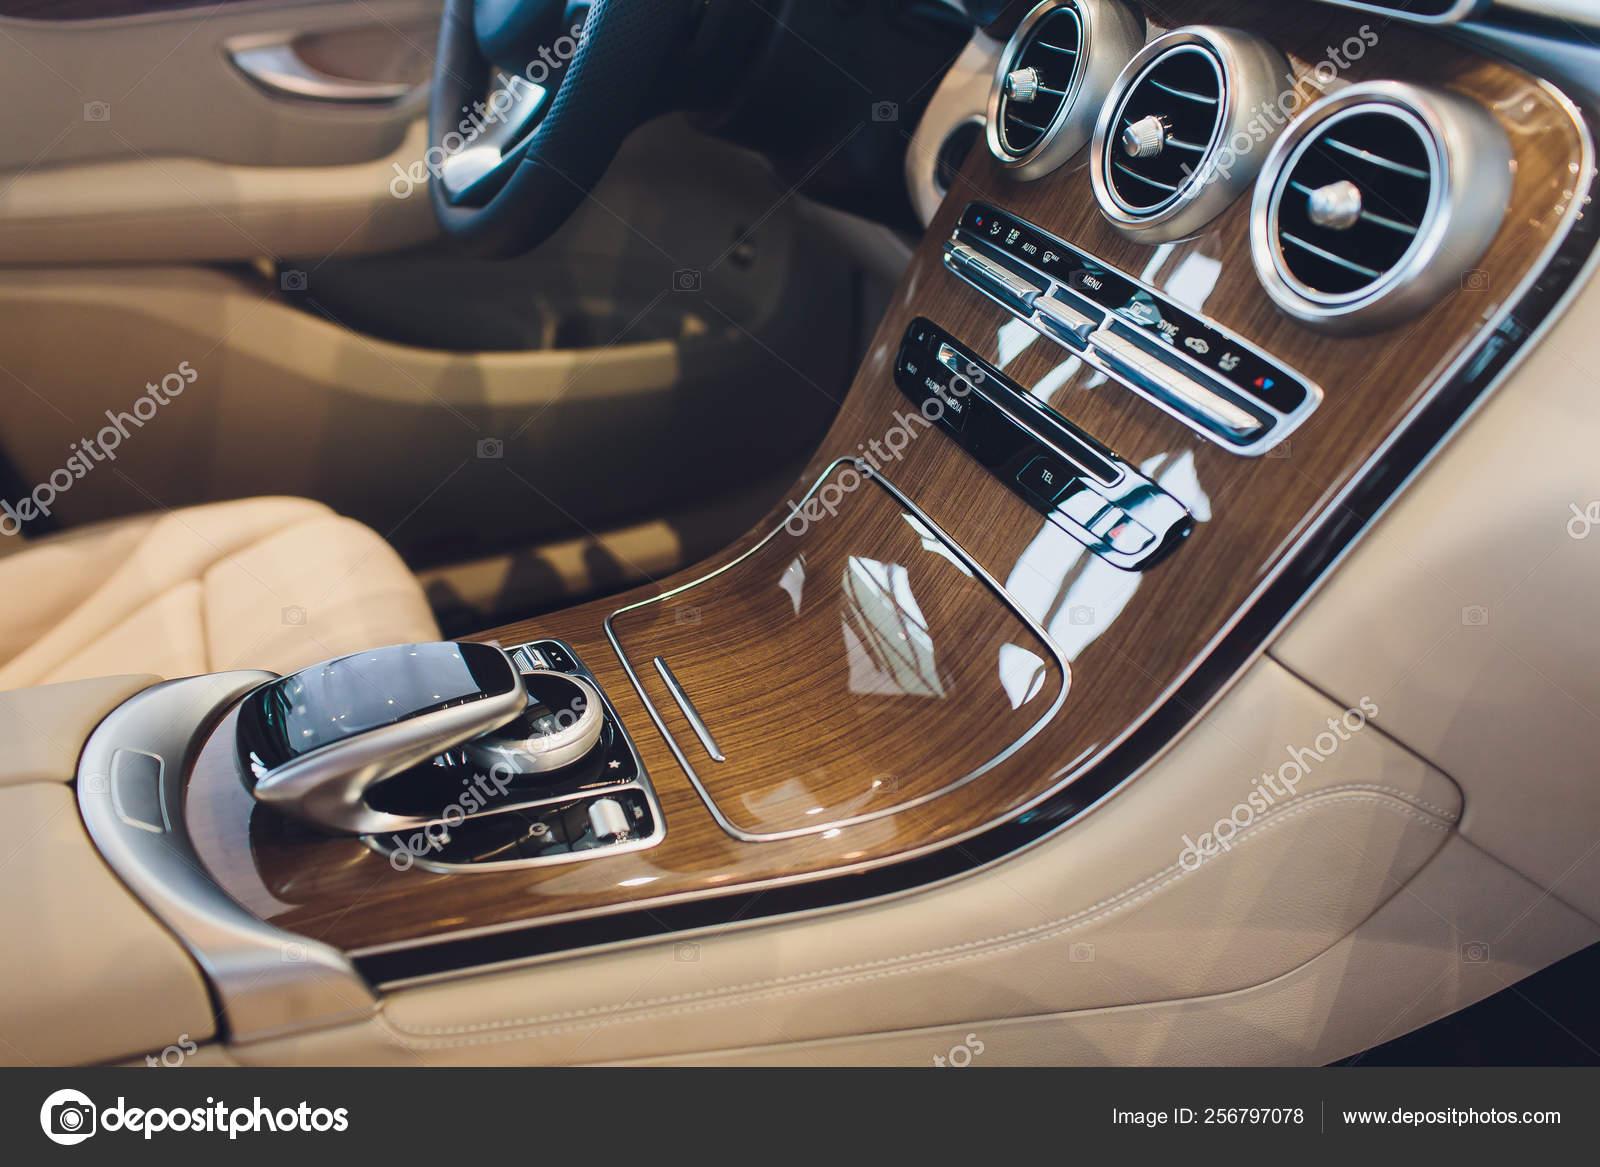 Carro Interior Moderno Com Assento De Couro Branco Veiculo Stock Photo C Vershinin Photo 256797078